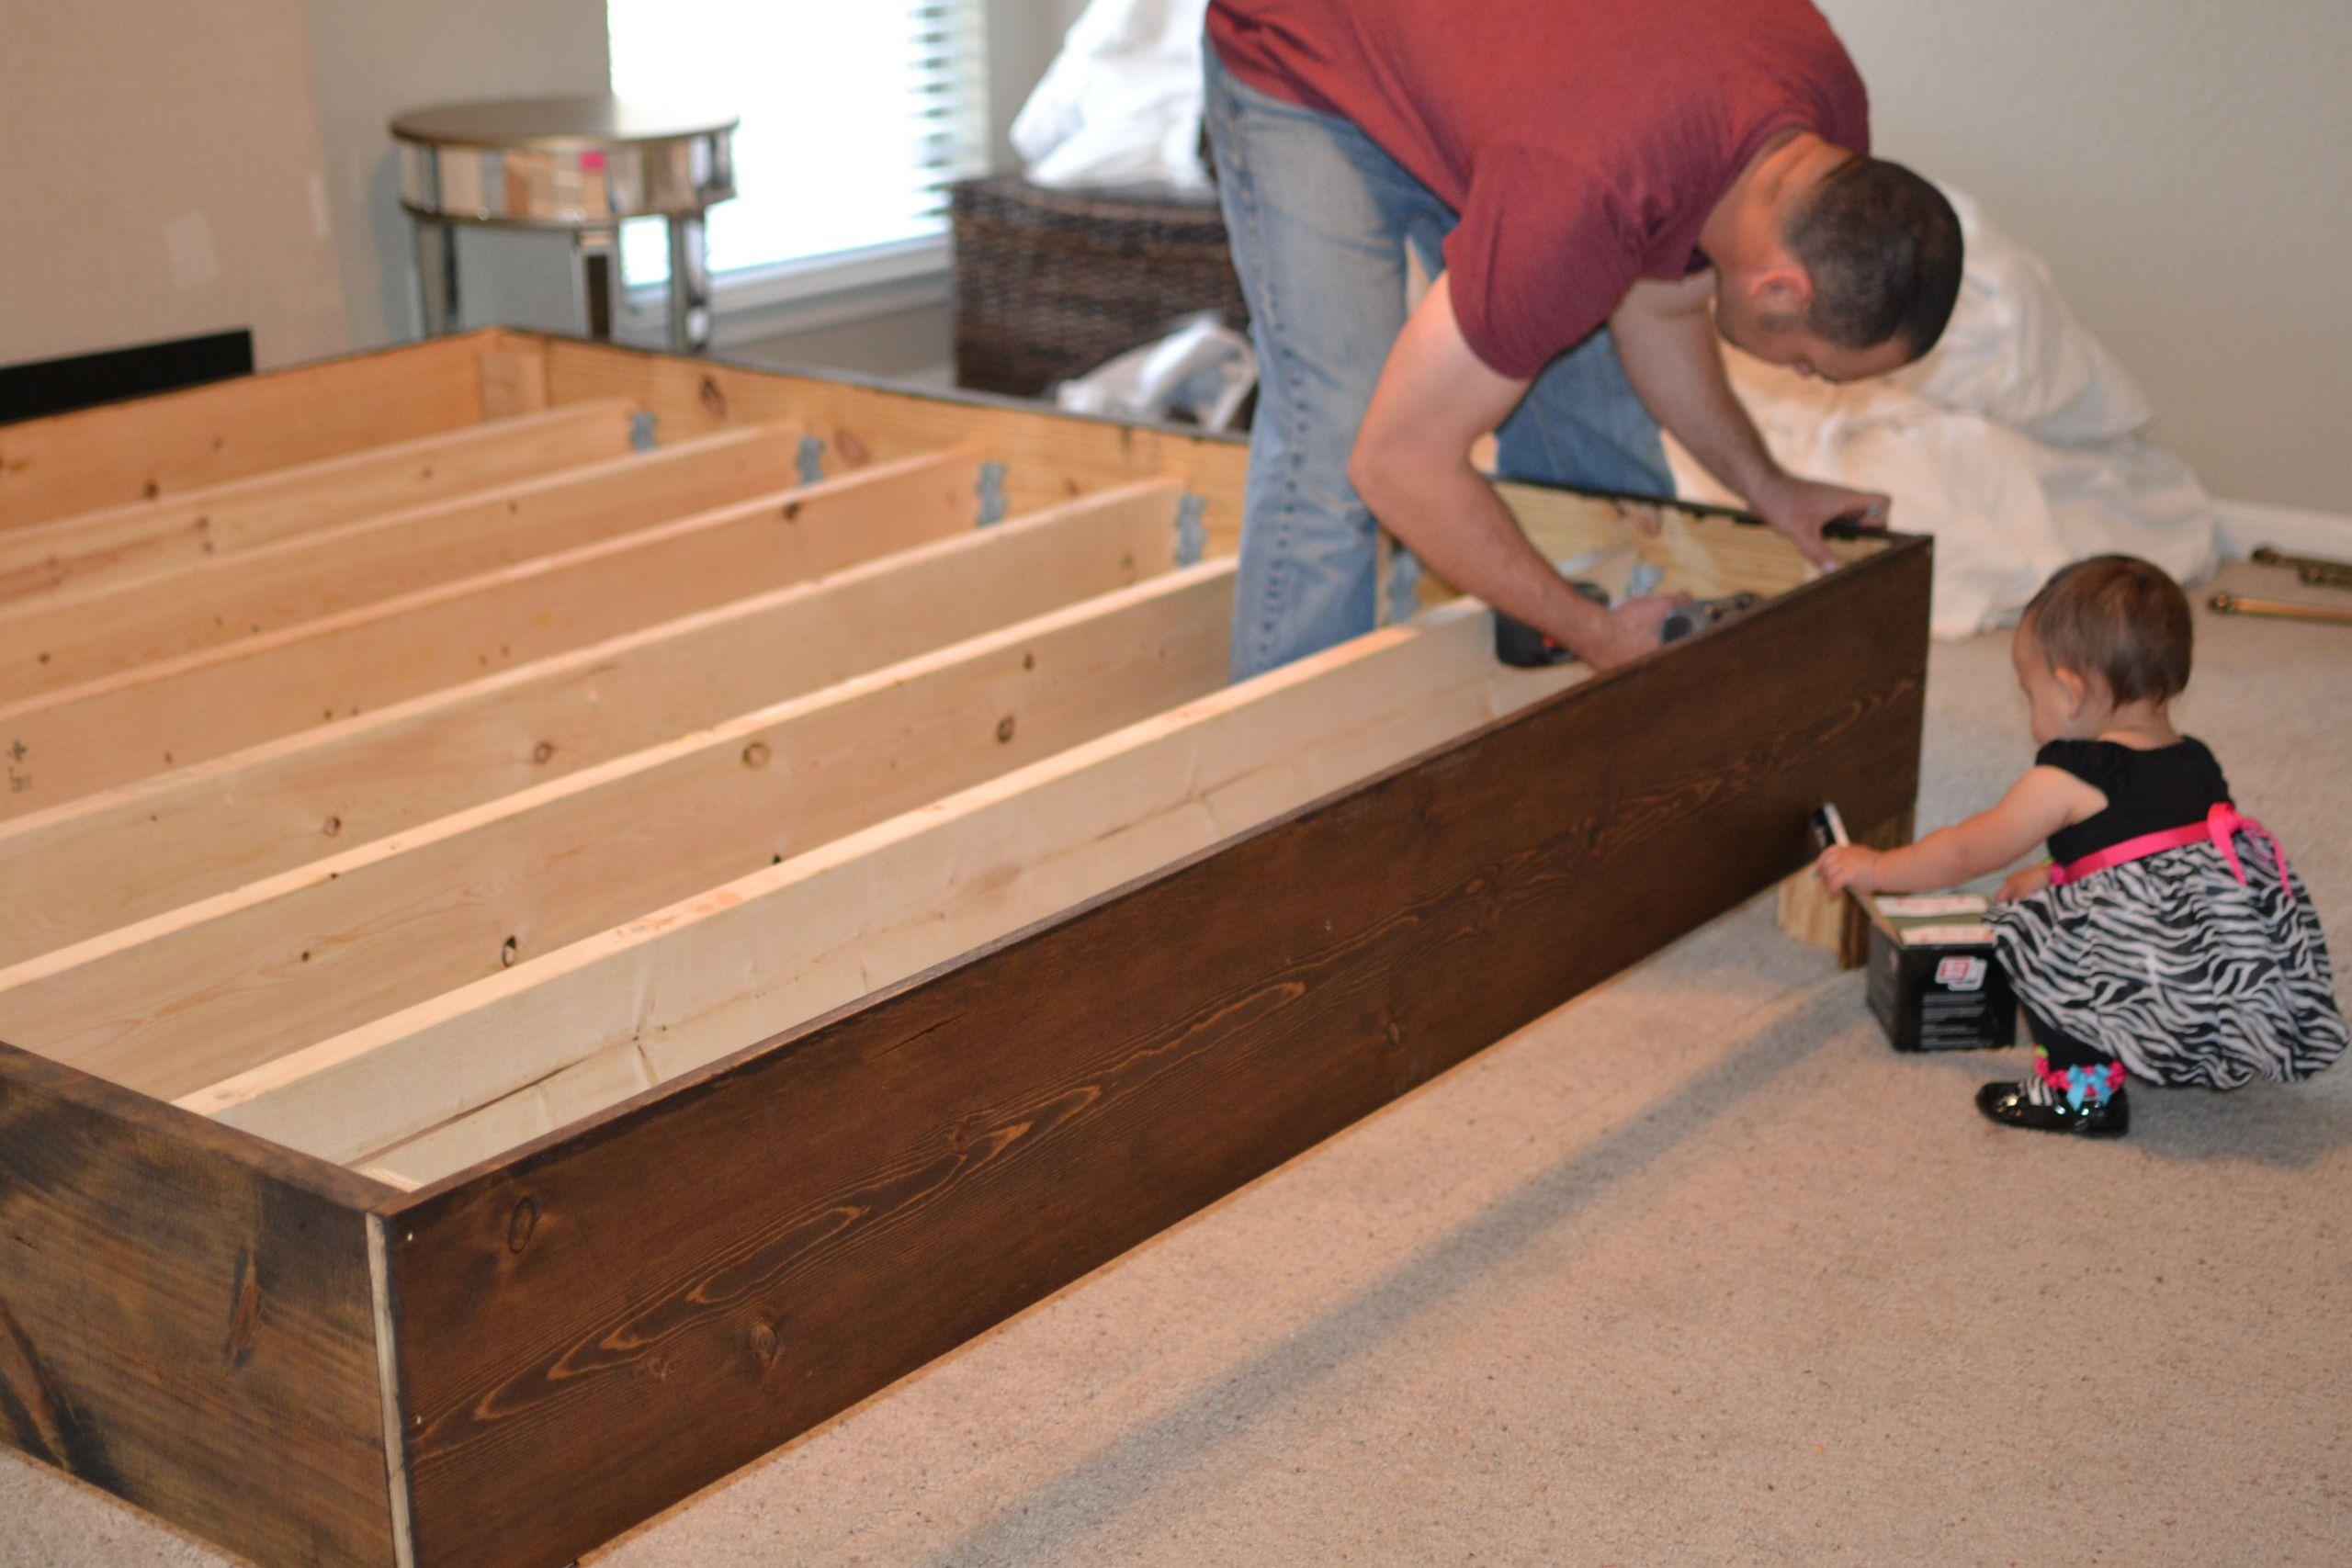 DIY Wooden Bed Frame With Storage  Bedroom Wooden Homemade Bed Frame For Your Bedroom